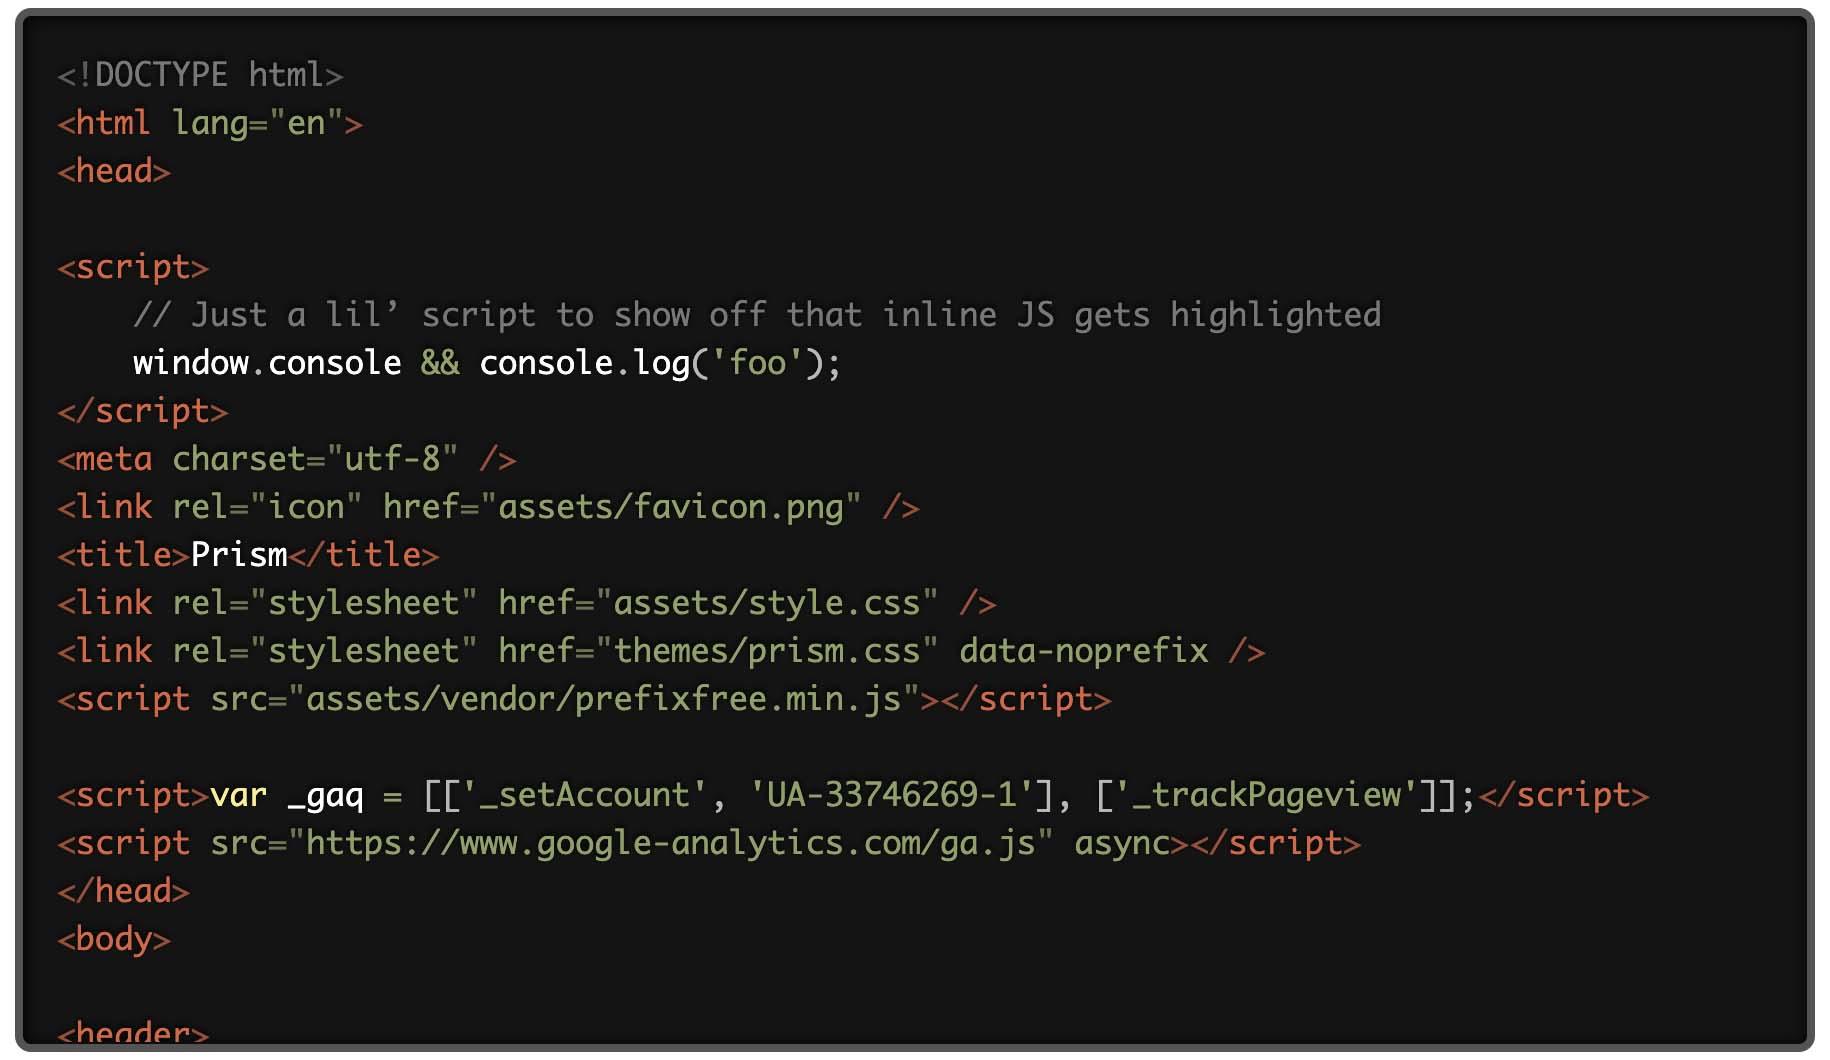 Prism.jsでTwilightのテーマを選択した際のコード表示